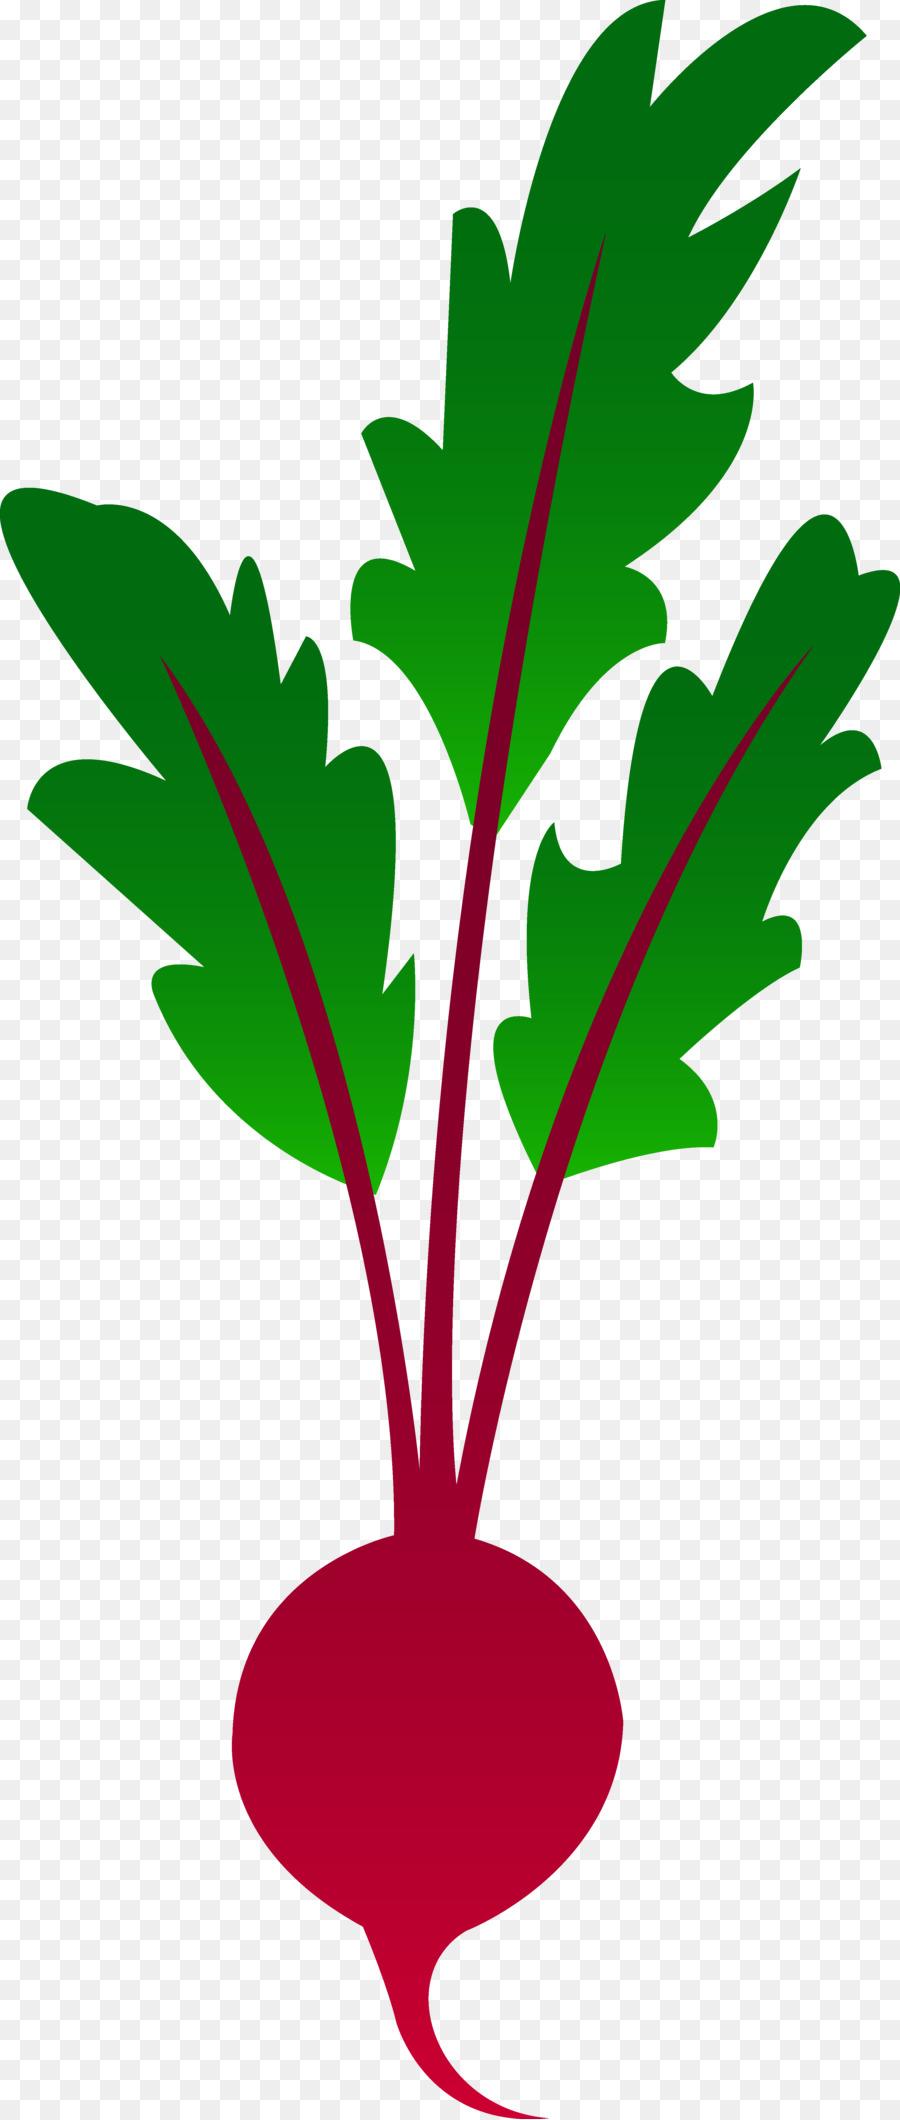 beetroot vegetable clip art vegetable garden clipart png download rh kisspng com  vegetable garden clipart powerpoint